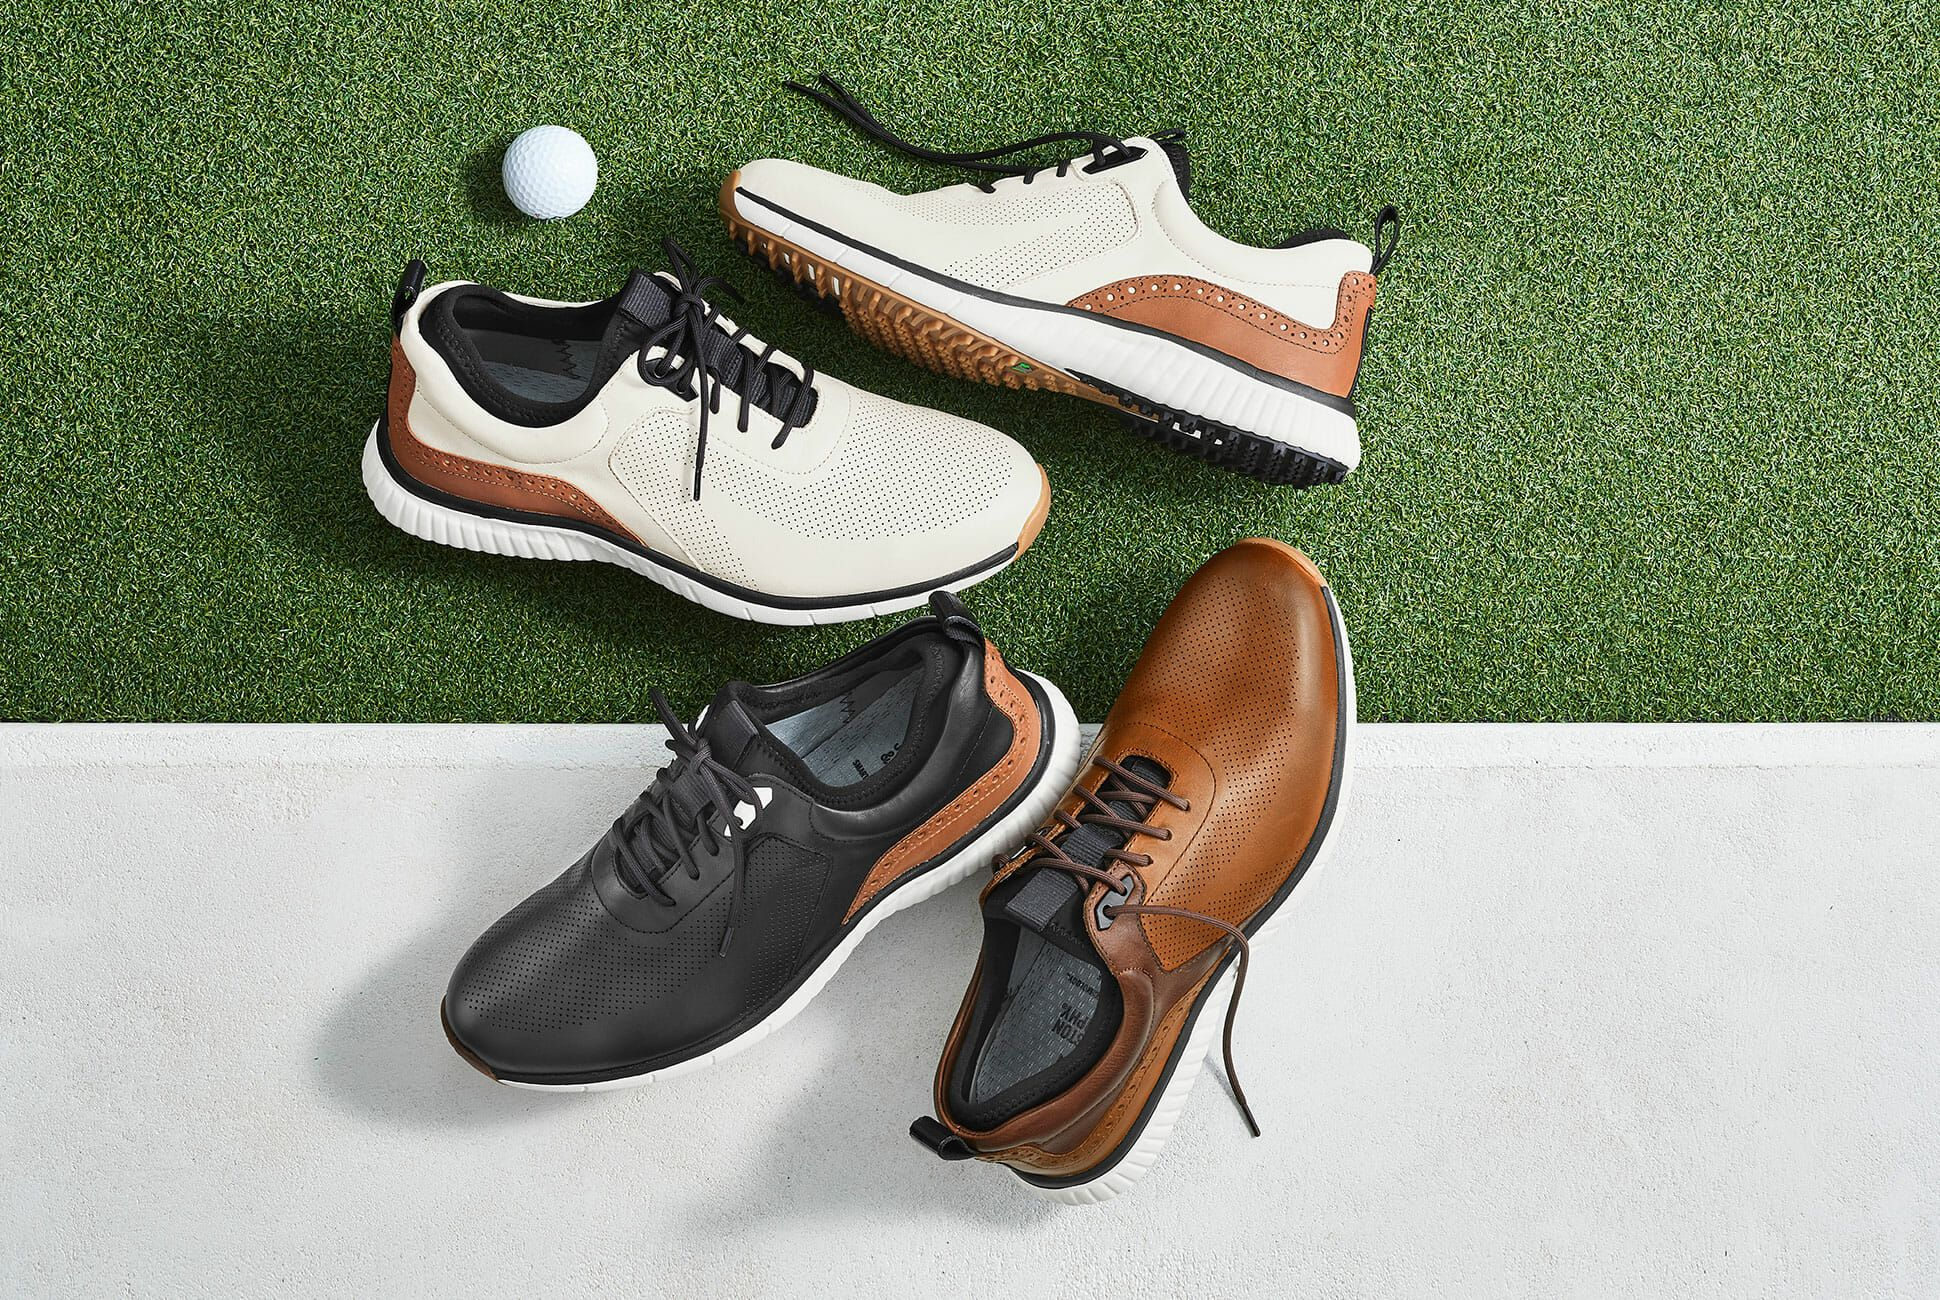 Johnston \u0026 Murphy's New Golf Shoes